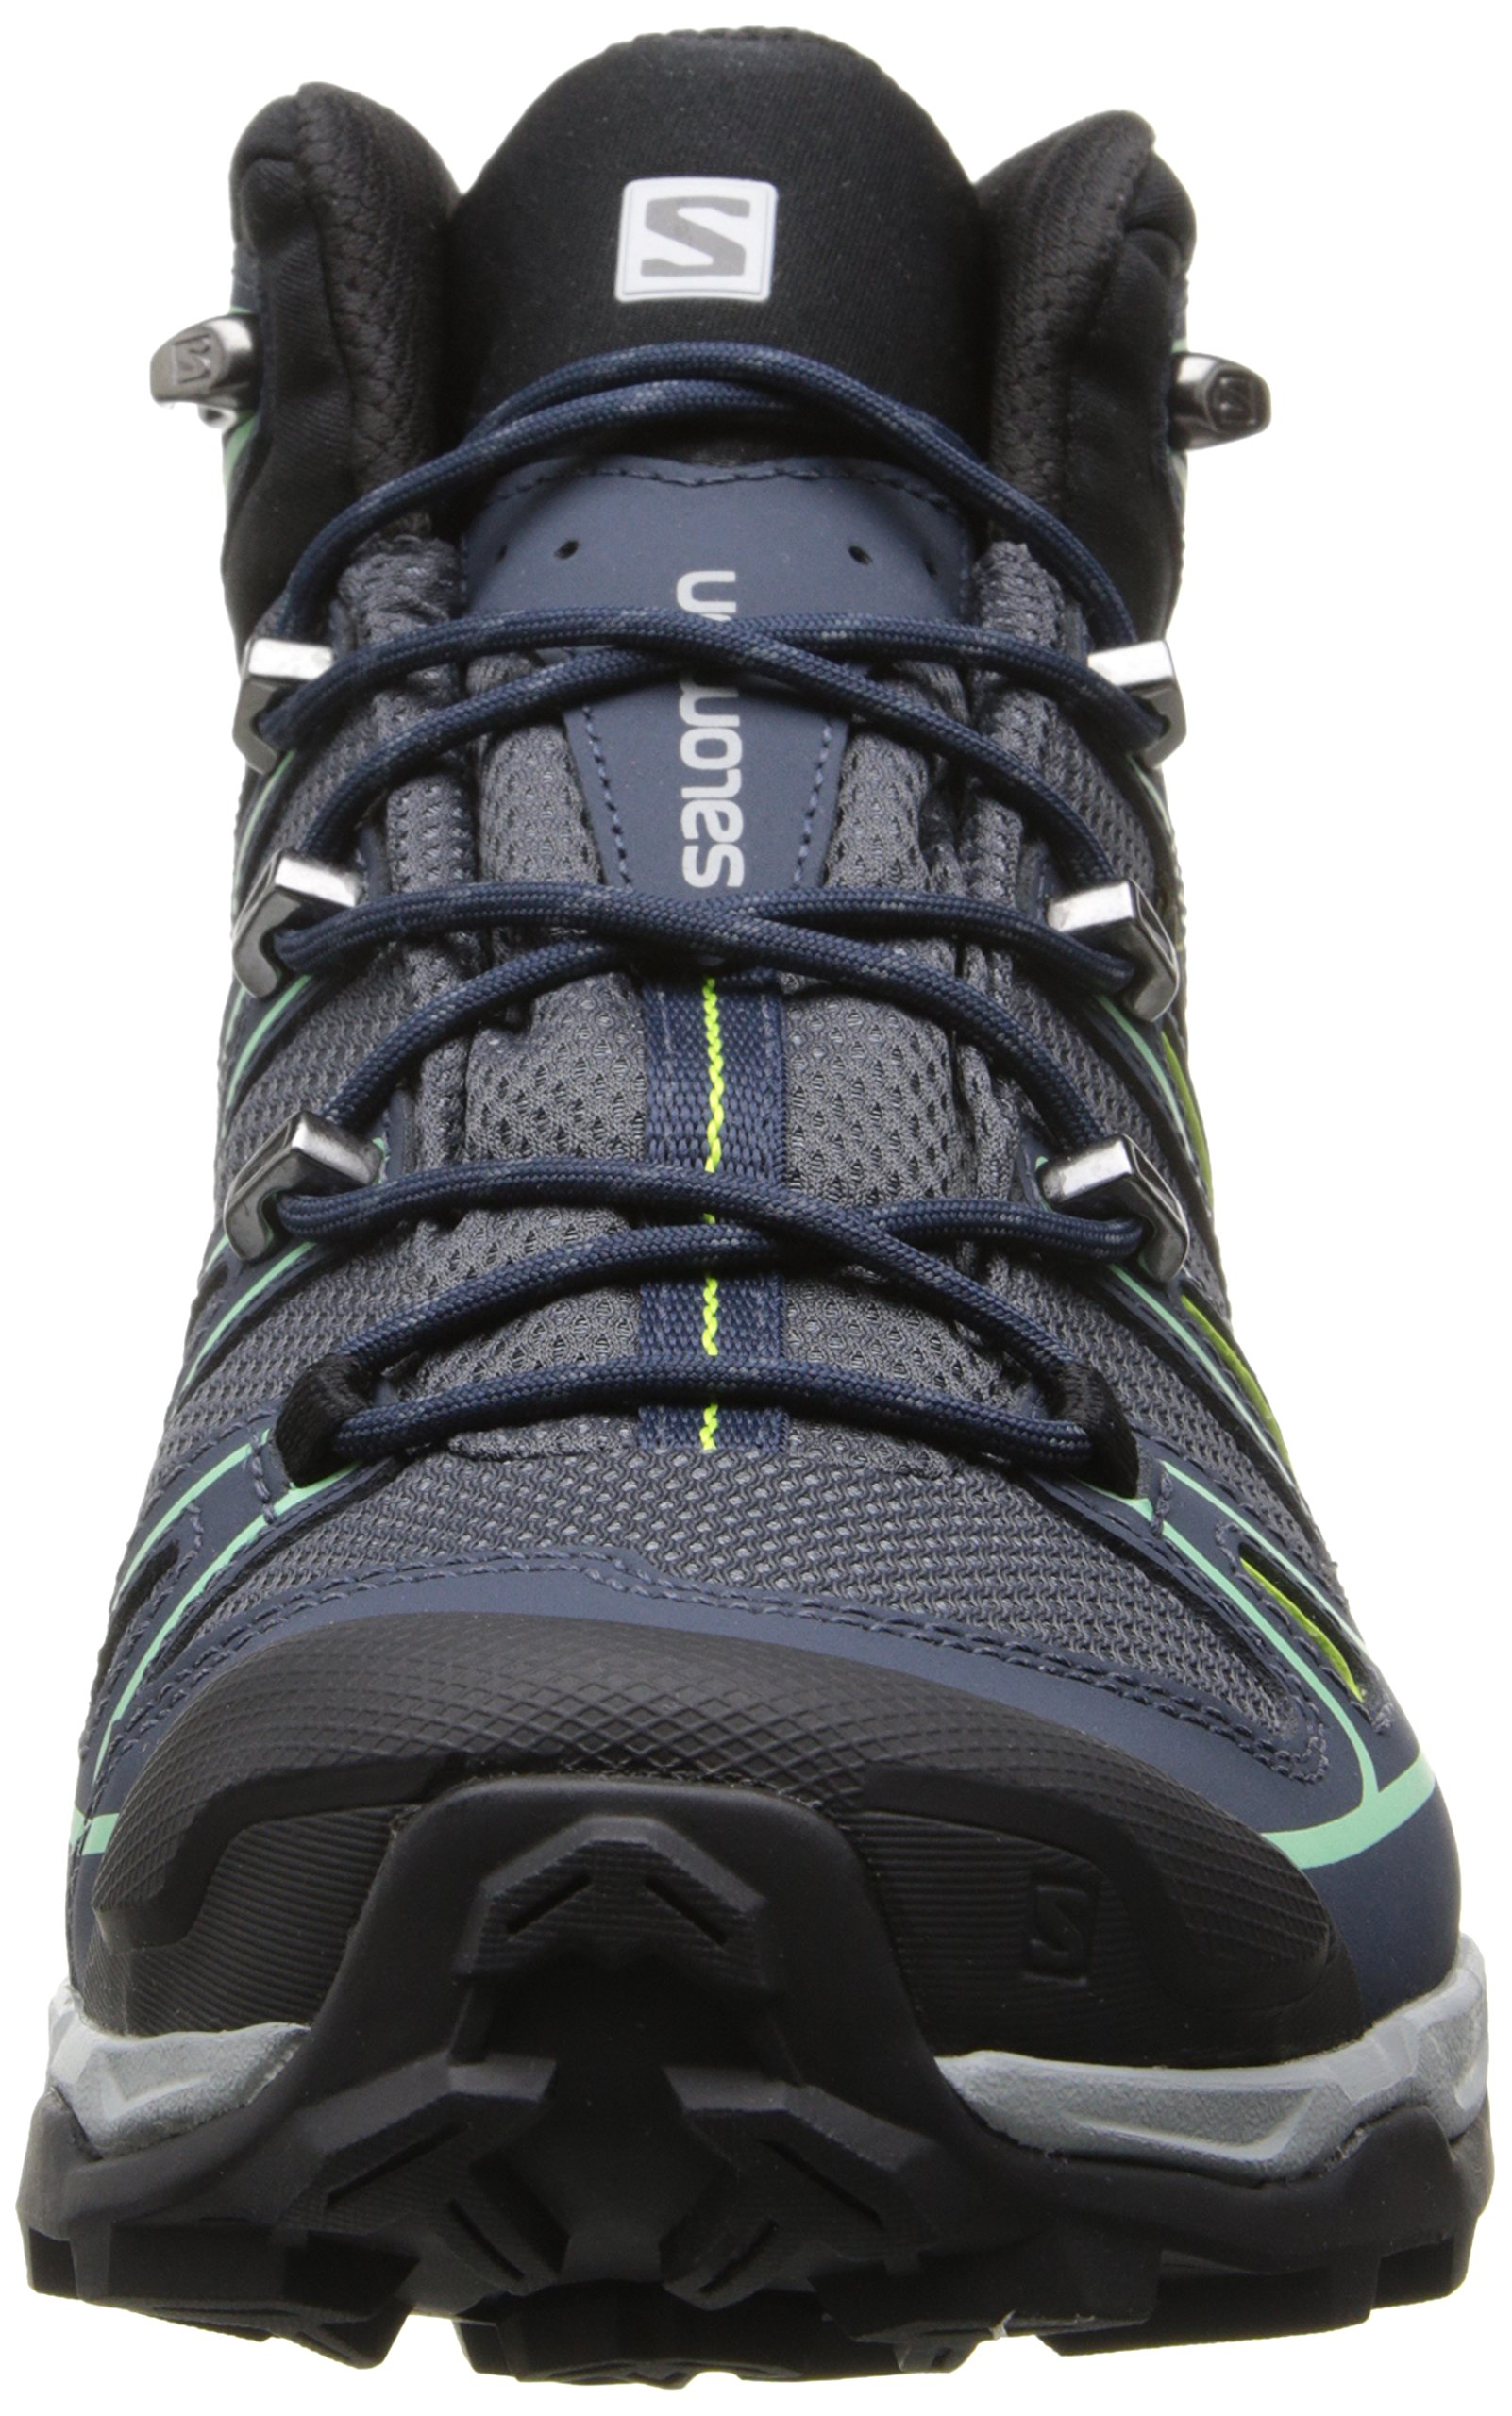 Salomon Women's X Ultra Mid 2 GTX Hiking Shoe, Grey Denim/Deep Blue/Lucite Green, 9 M US by Salomon (Image #4)